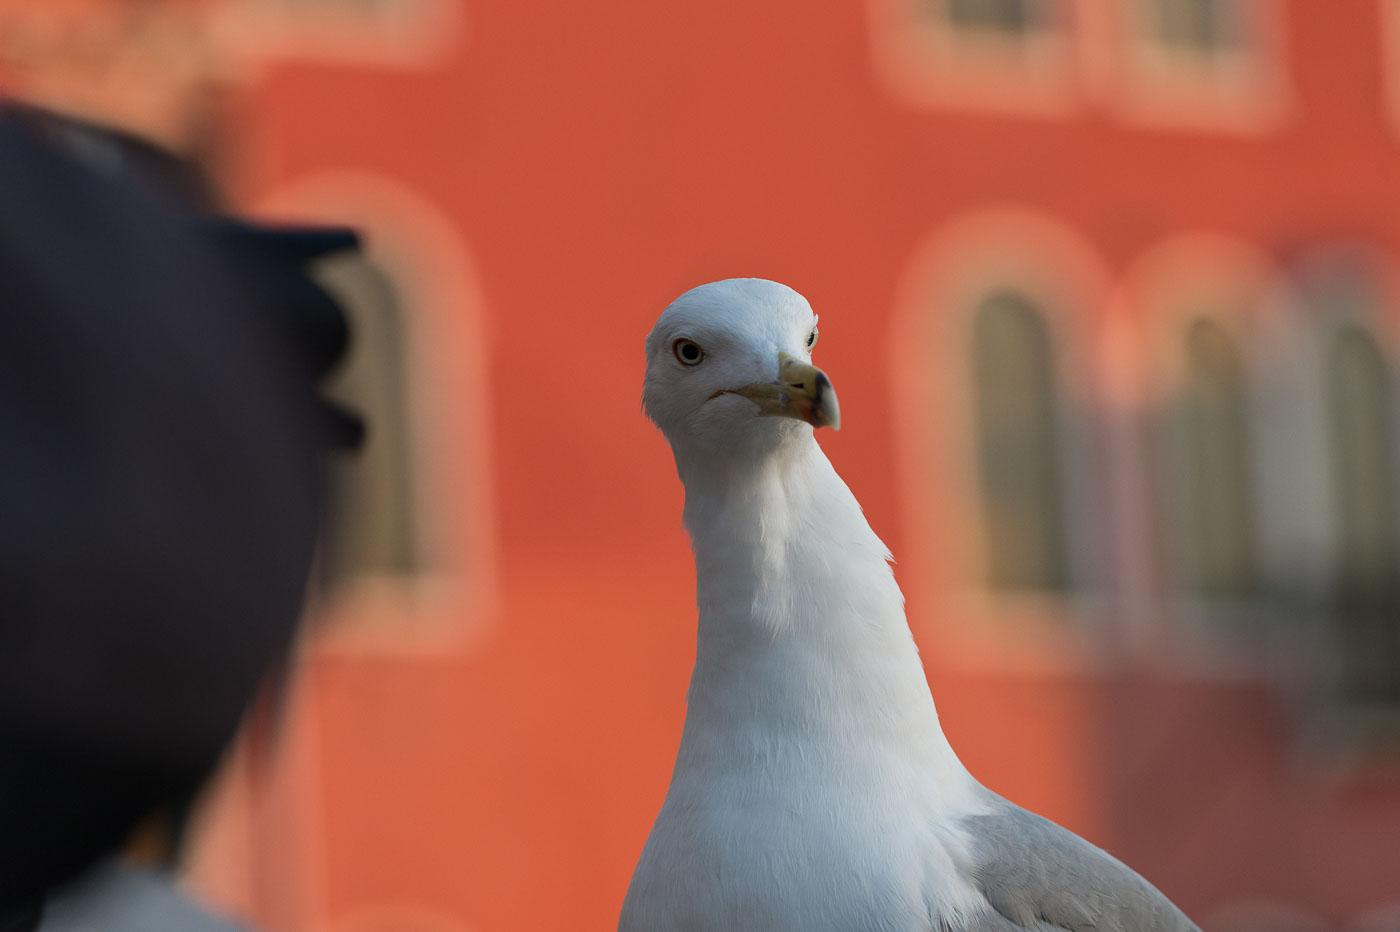 Venice Street Photography (2015)